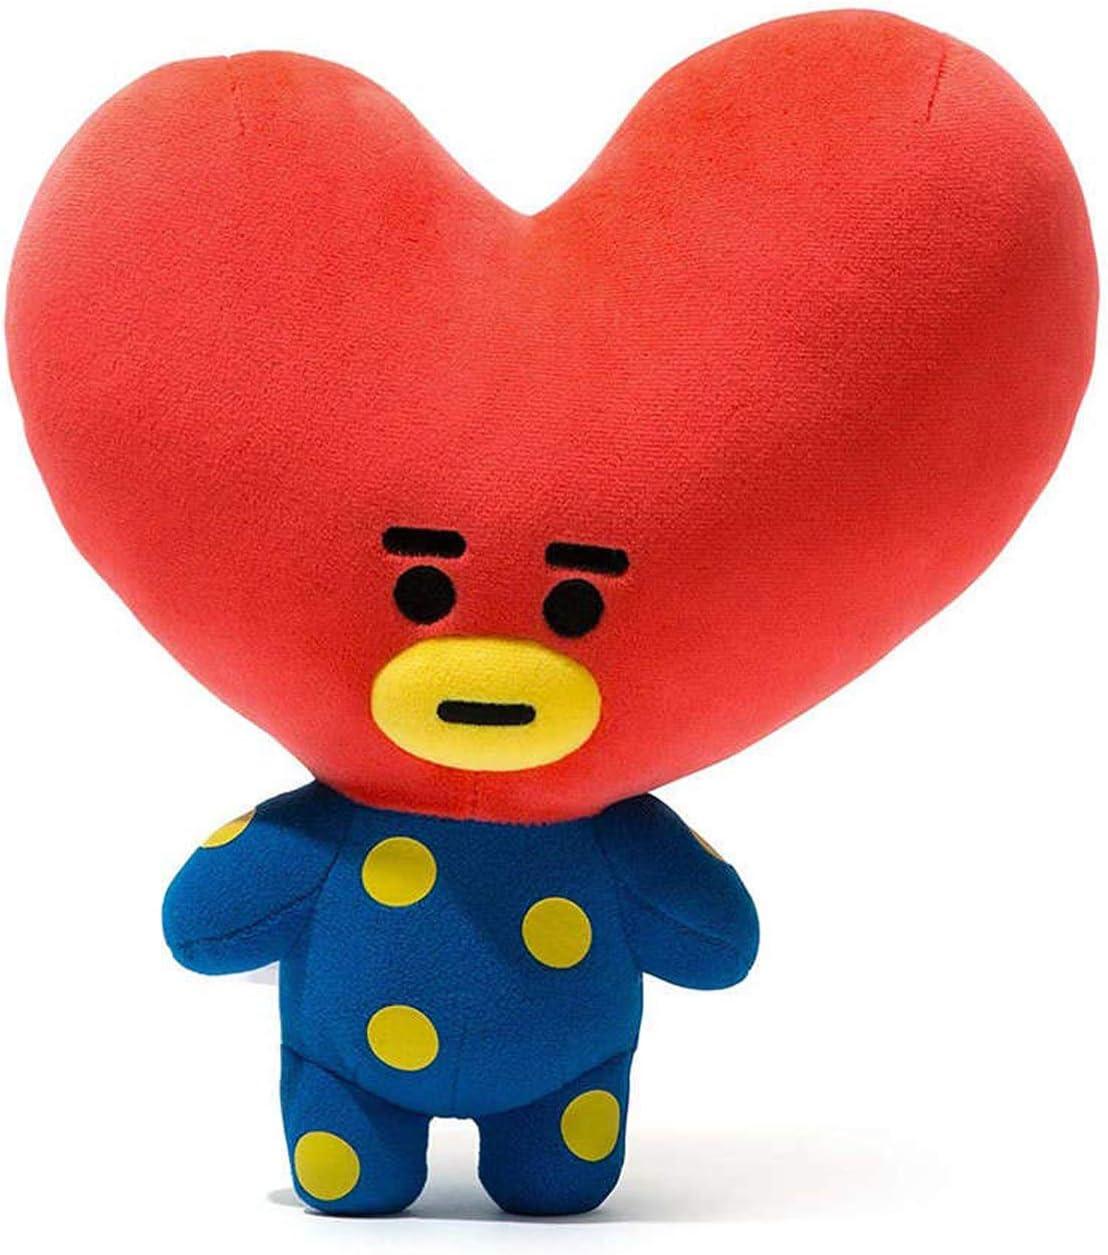 BTS Plush Toy Baby Doll Pillow Soft Animal Stuffed Plush Doll 8 inch Love